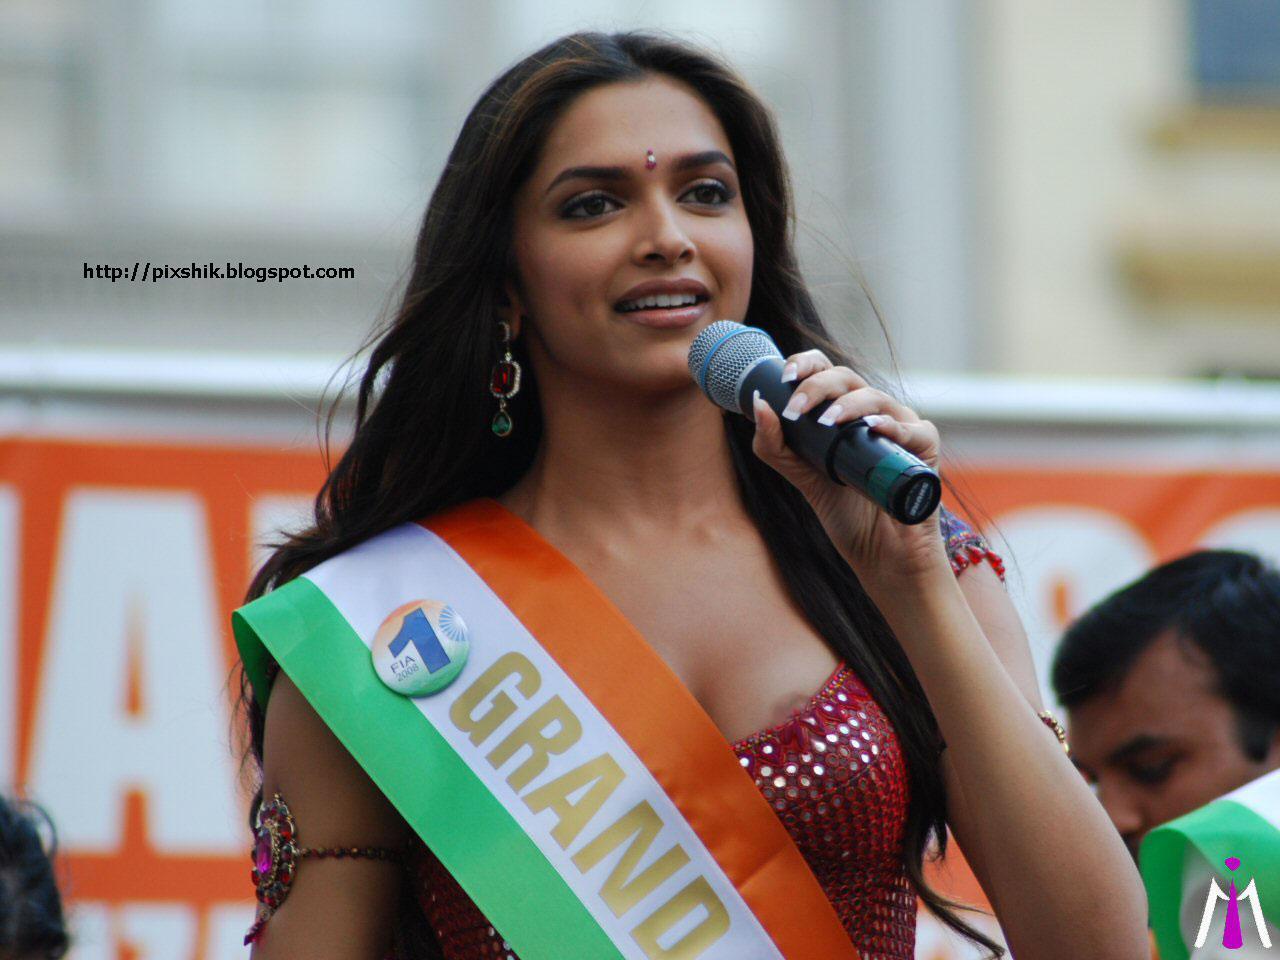 Deepika Padukone Nipple Slip Hot Very Clear Visible